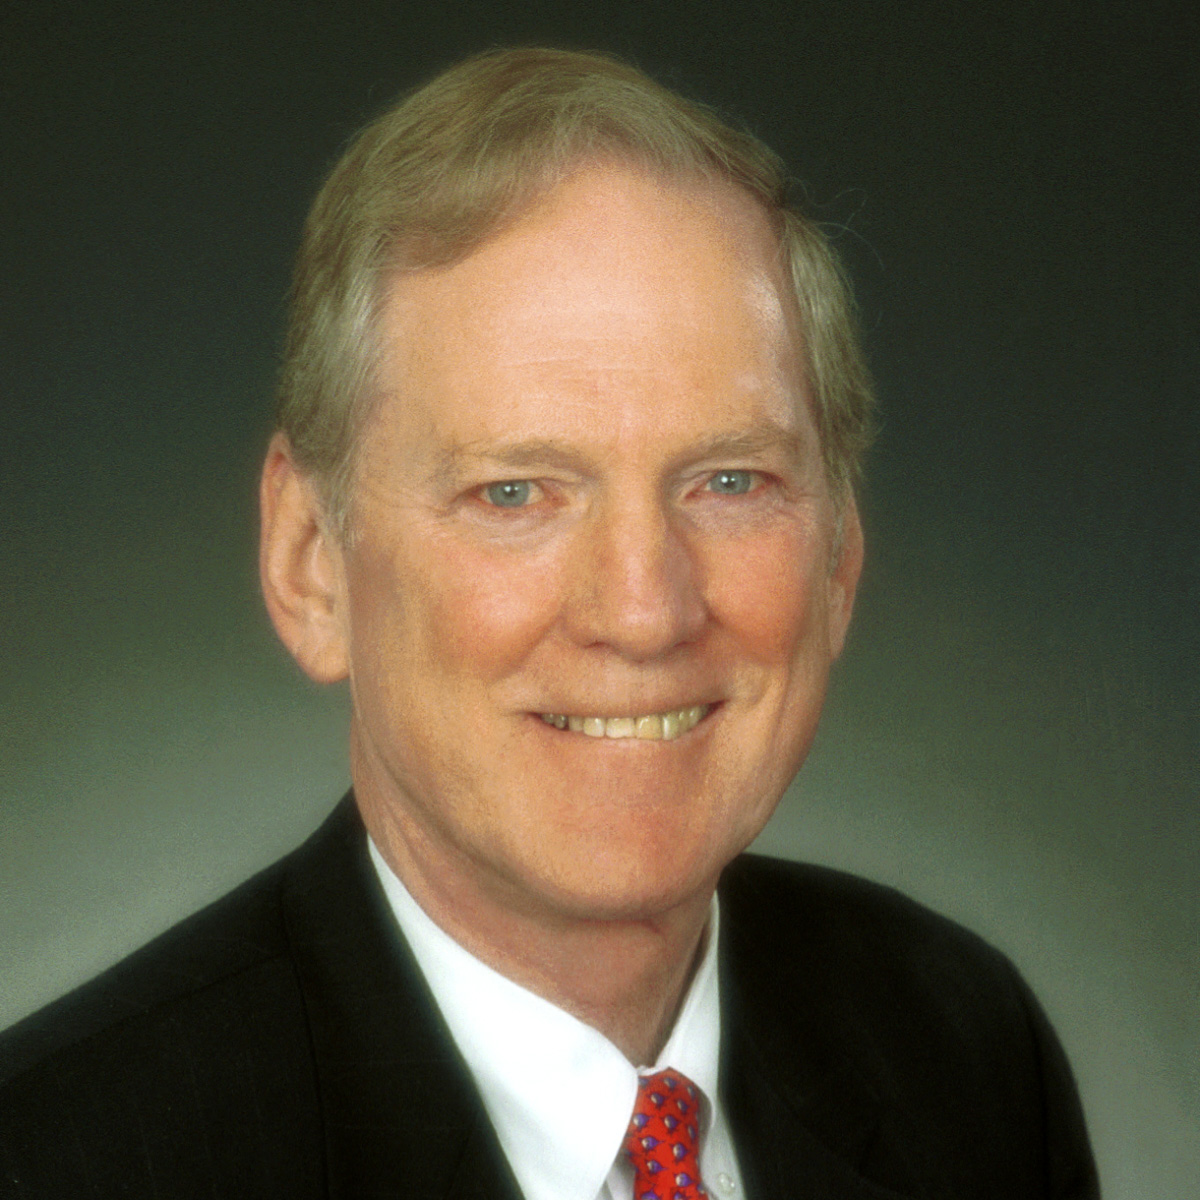 Walter J. Humann